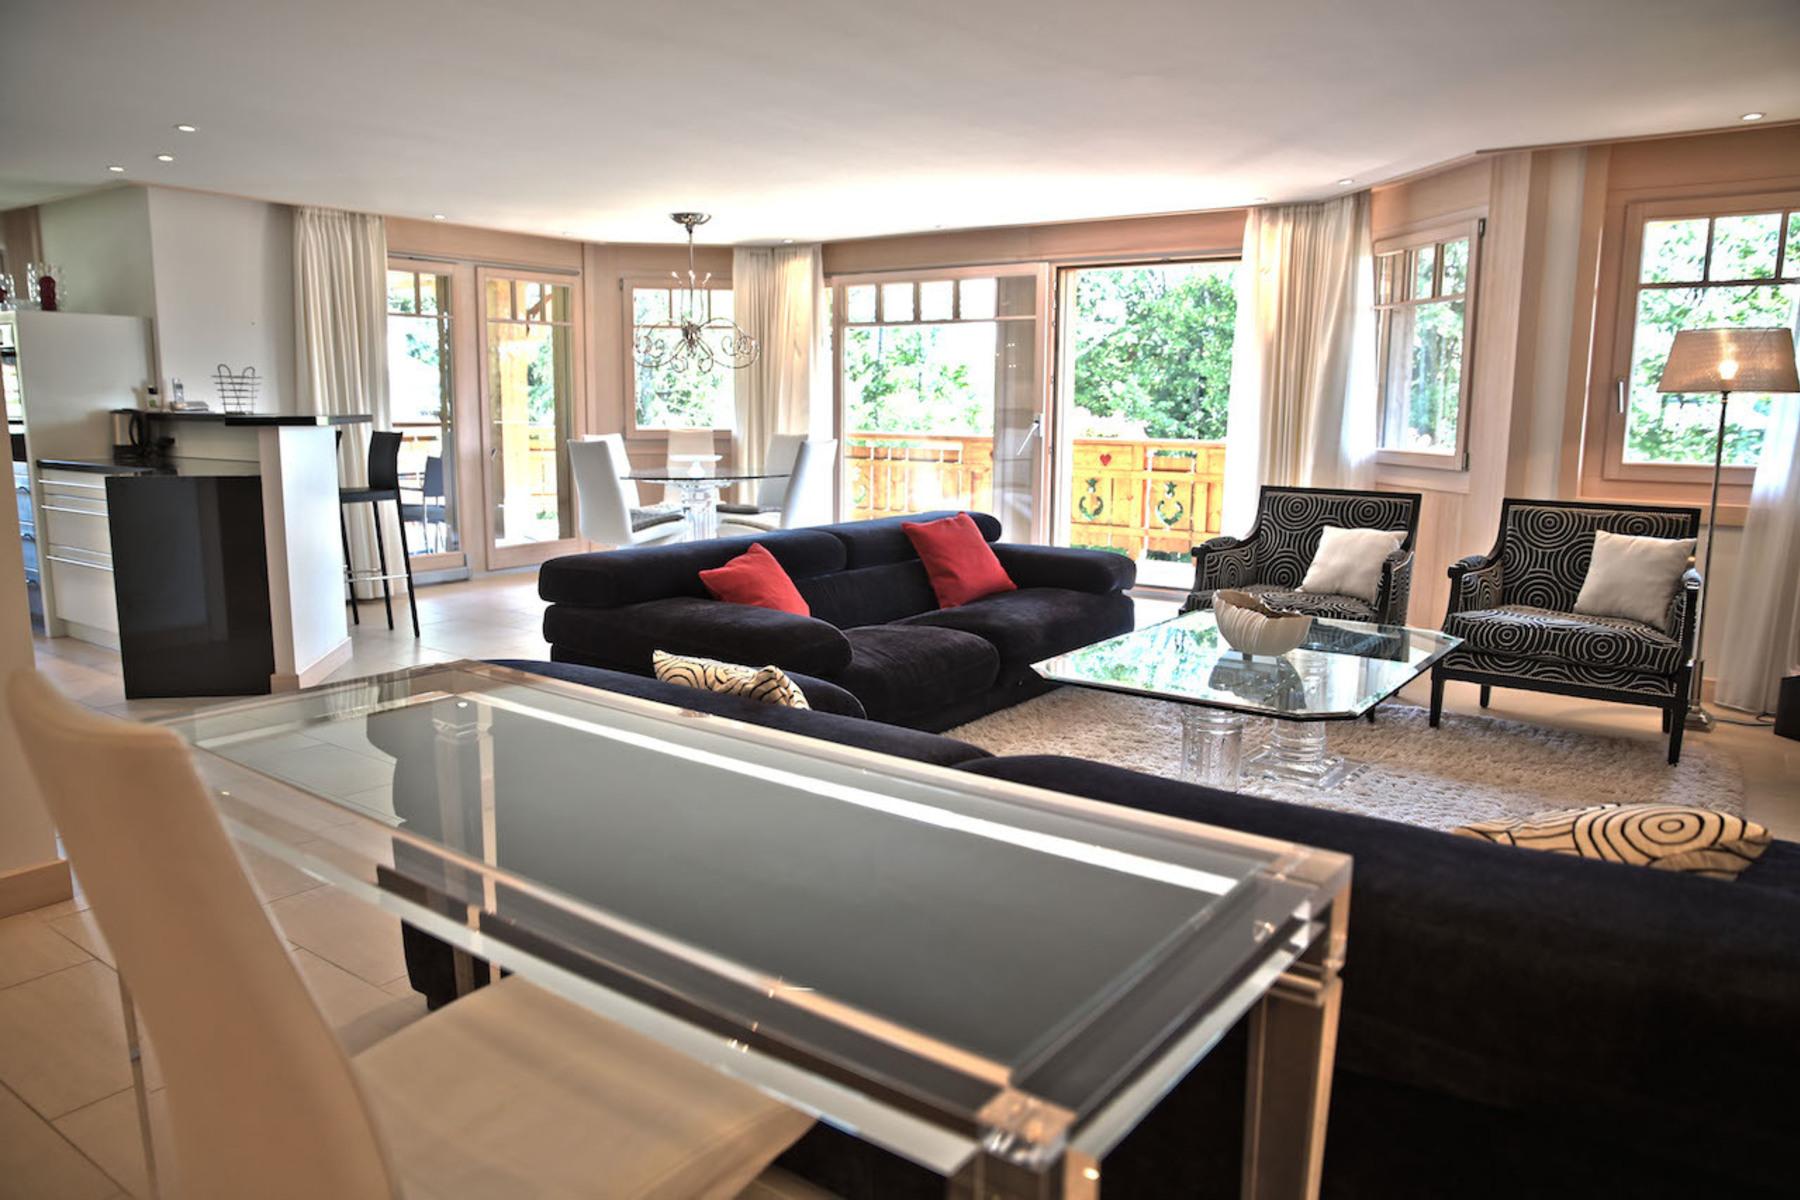 Condominium for Sale at Diana 6 Ch des Troubadours Villars-Sur-Ollon, Vaud, 1884 Switzerland